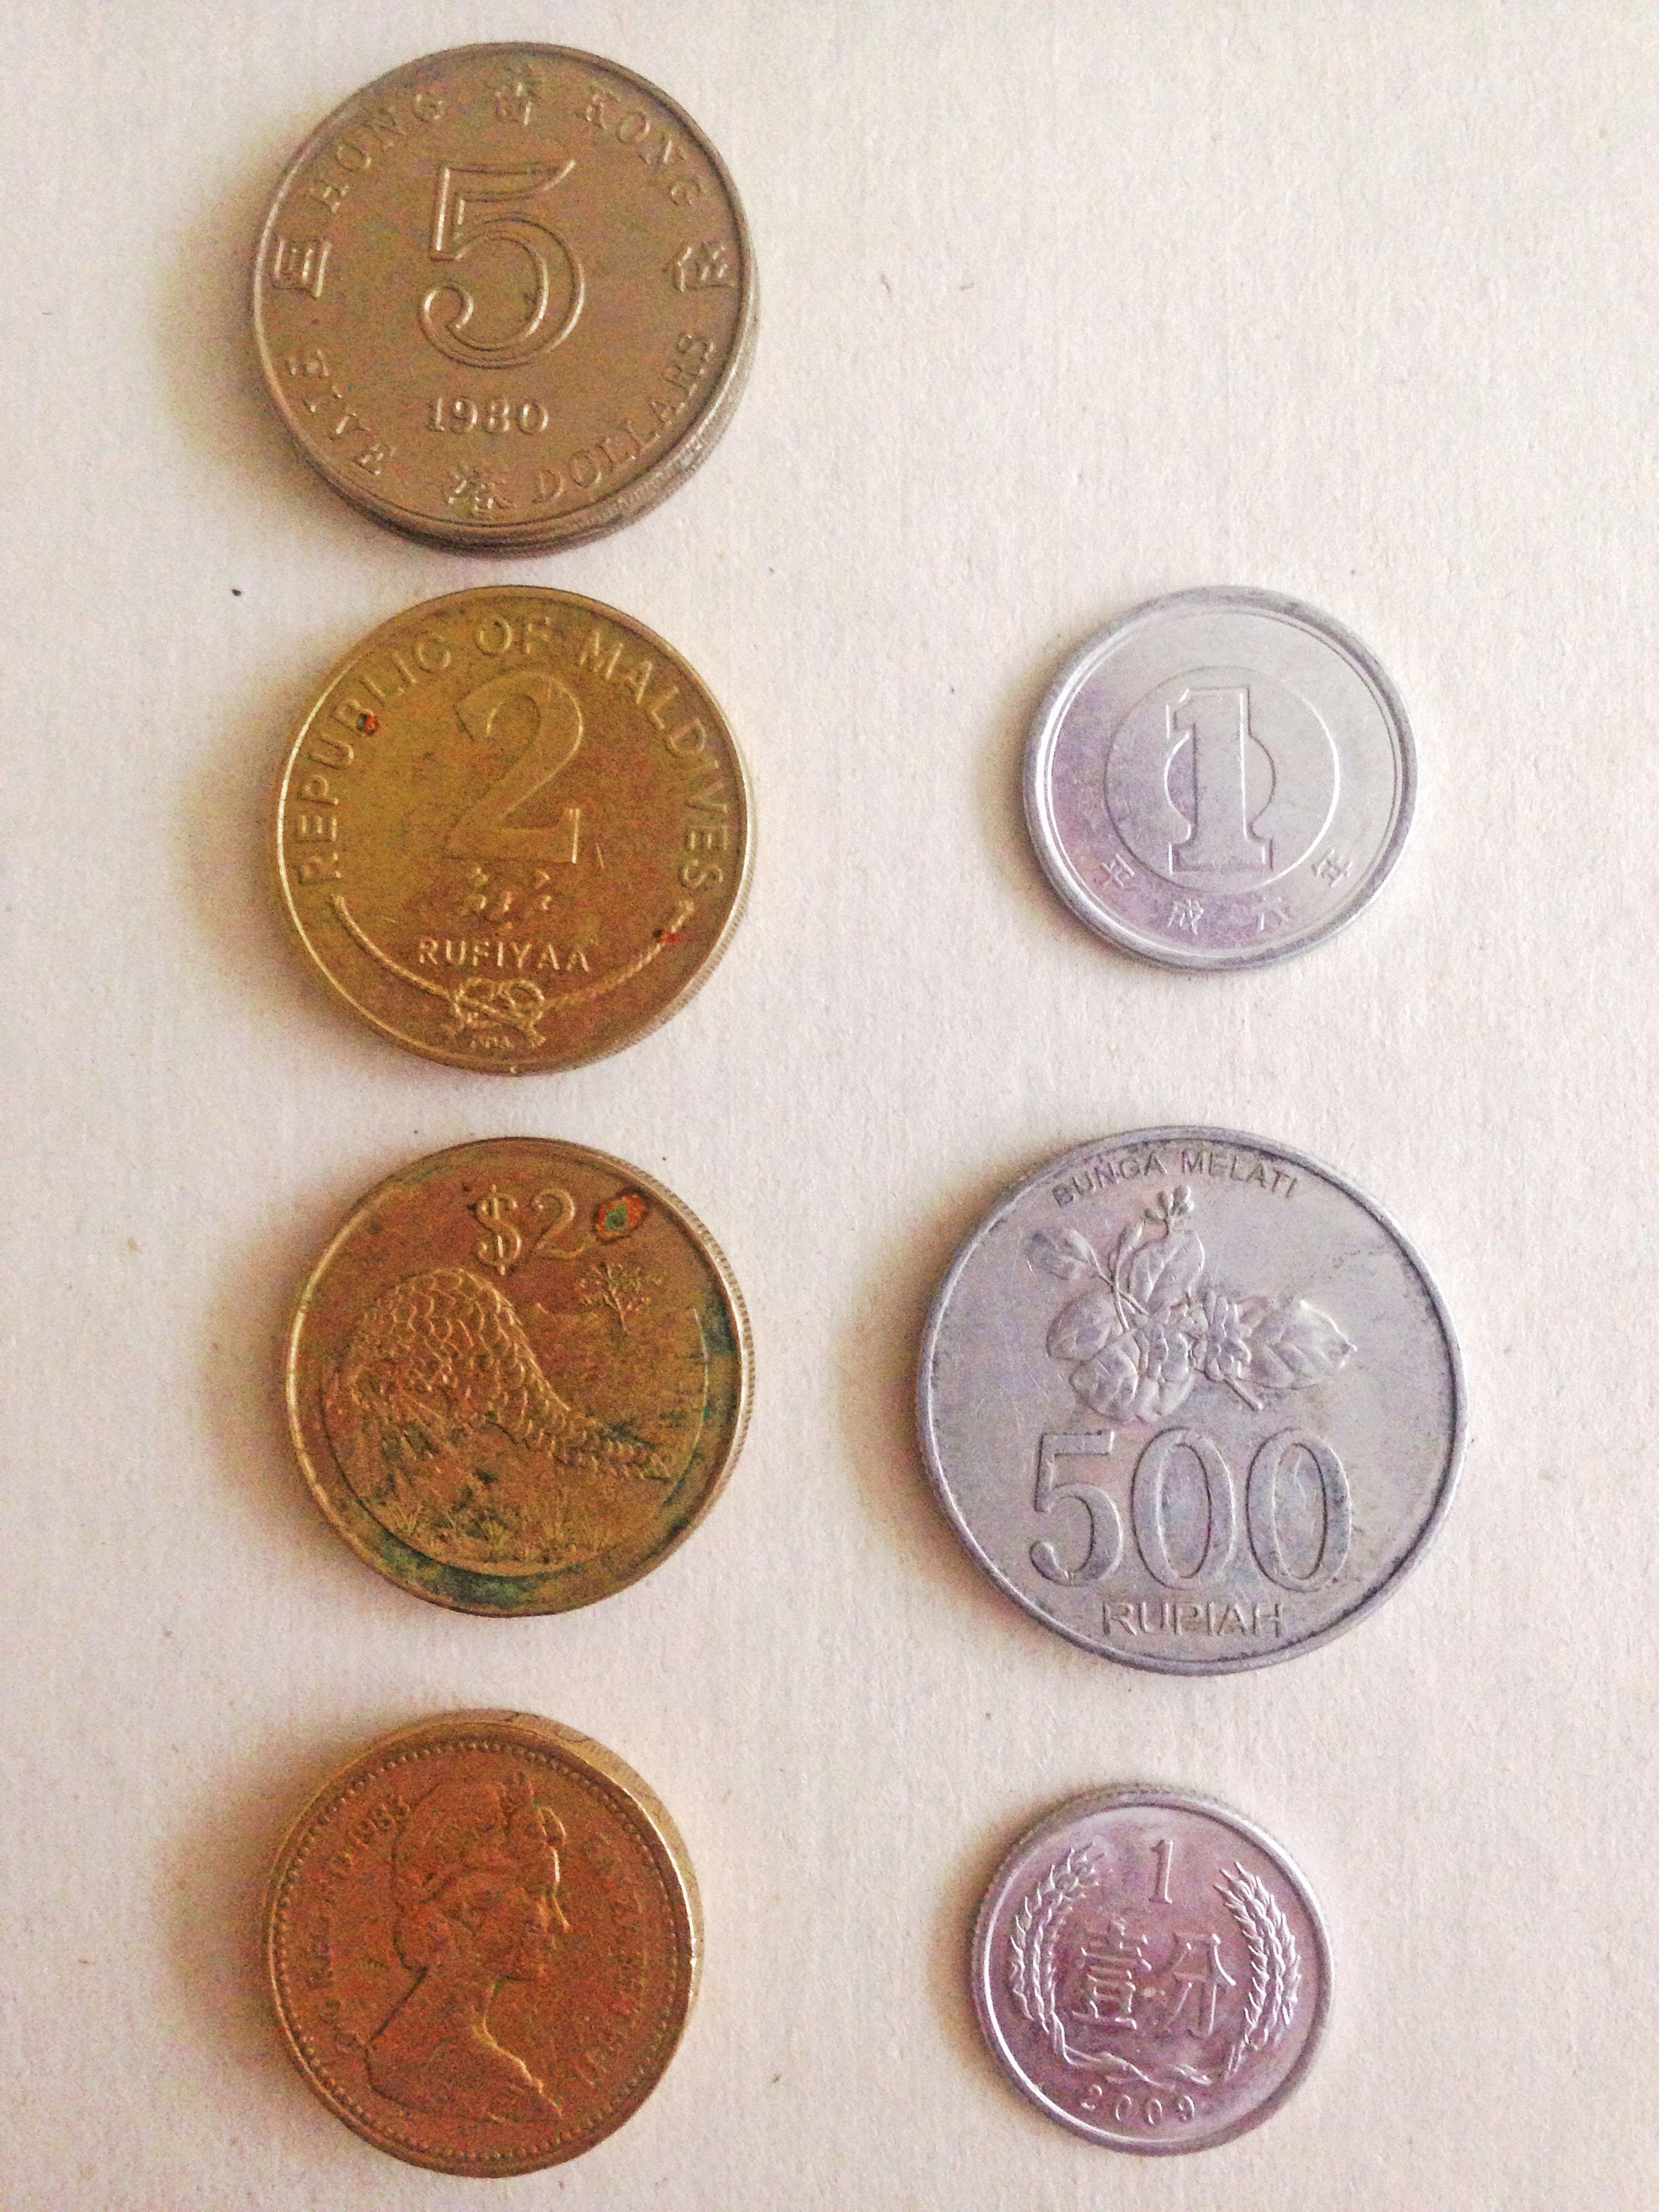 Money (Coin) Collection - Numismatist 2